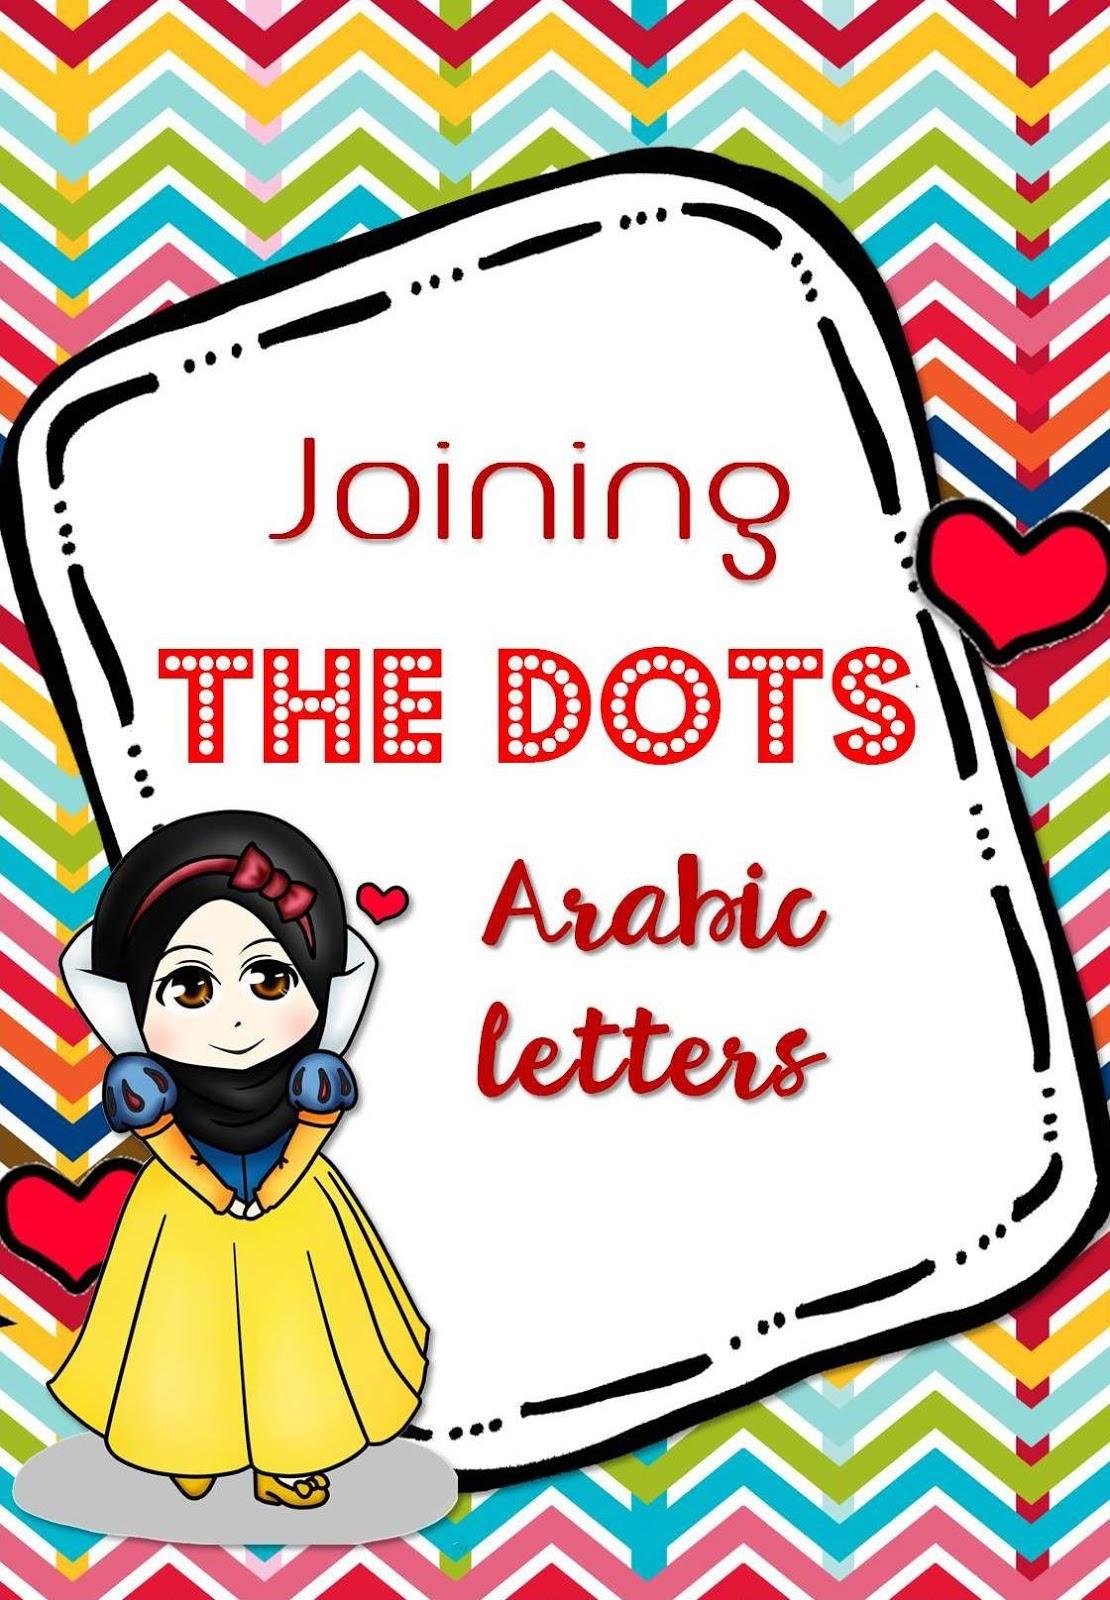 Free Arabic Joining The Dots Connect The Dots Dot To Dot Percuma Islamic Homeschooling